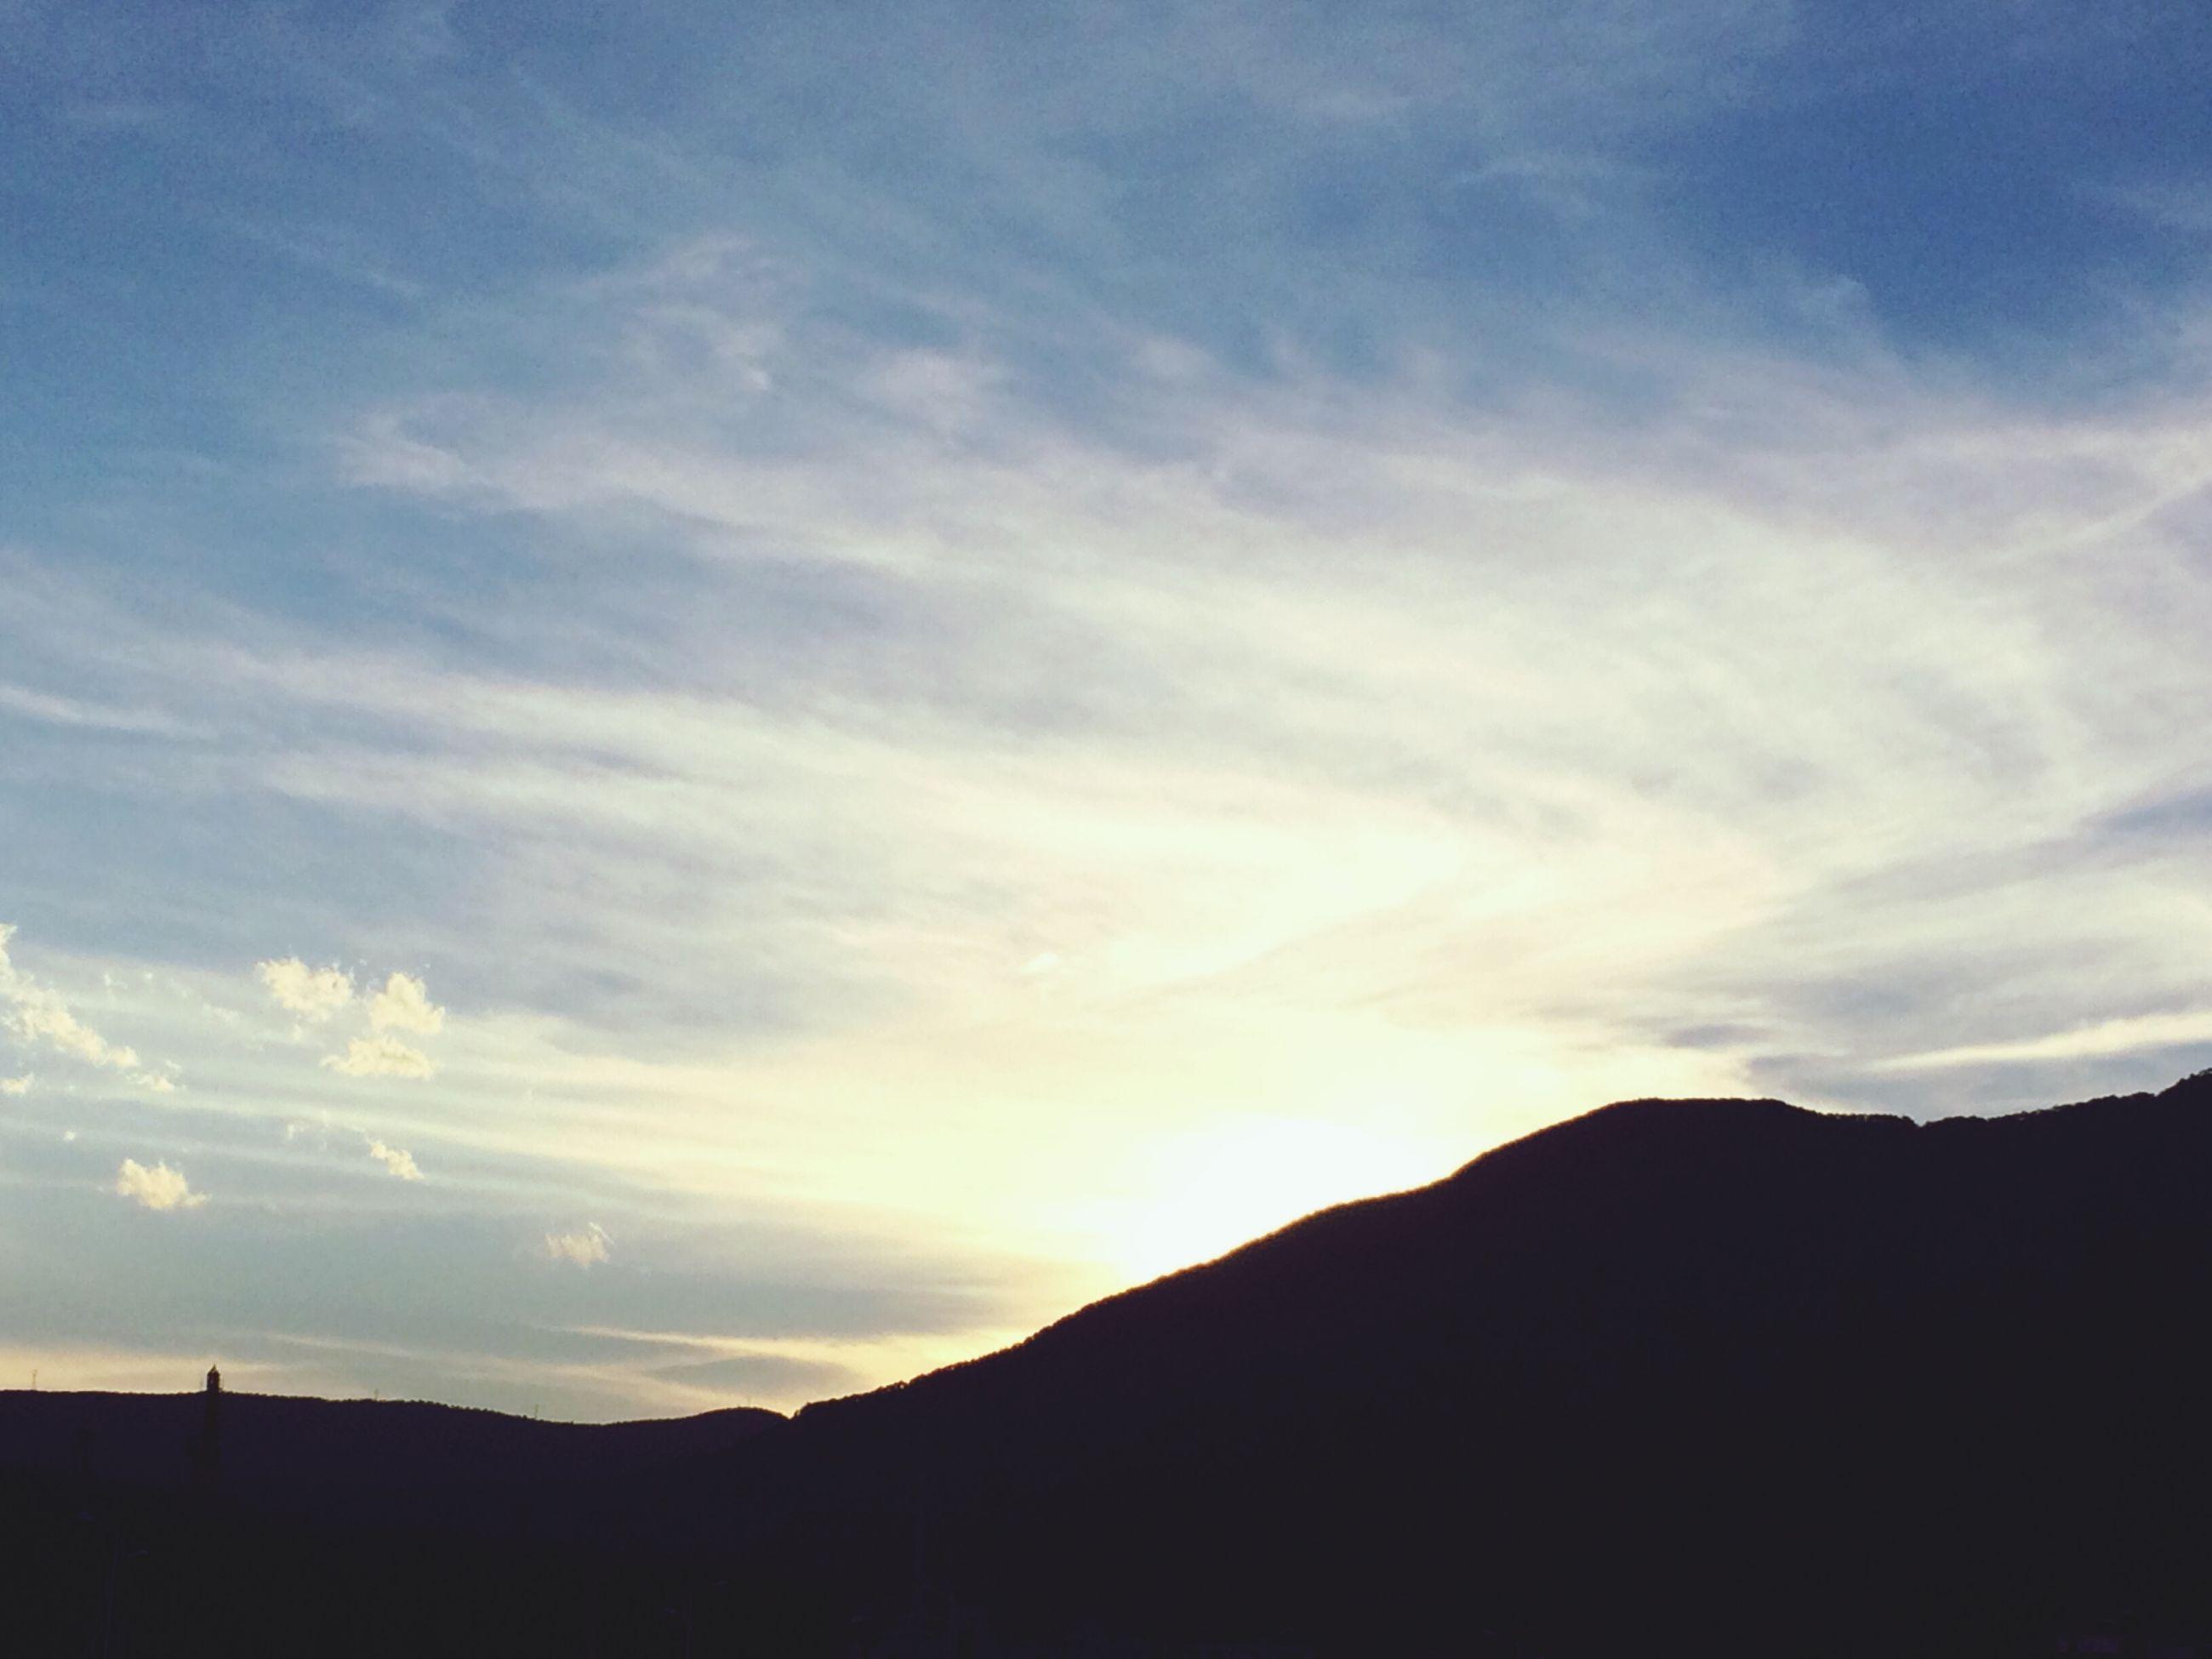 silhouette, tranquil scene, scenics, tranquility, sky, sunset, mountain, beauty in nature, cloud - sky, nature, mountain range, landscape, idyllic, cloud, dusk, non-urban scene, majestic, outdoors, cloudy, dark